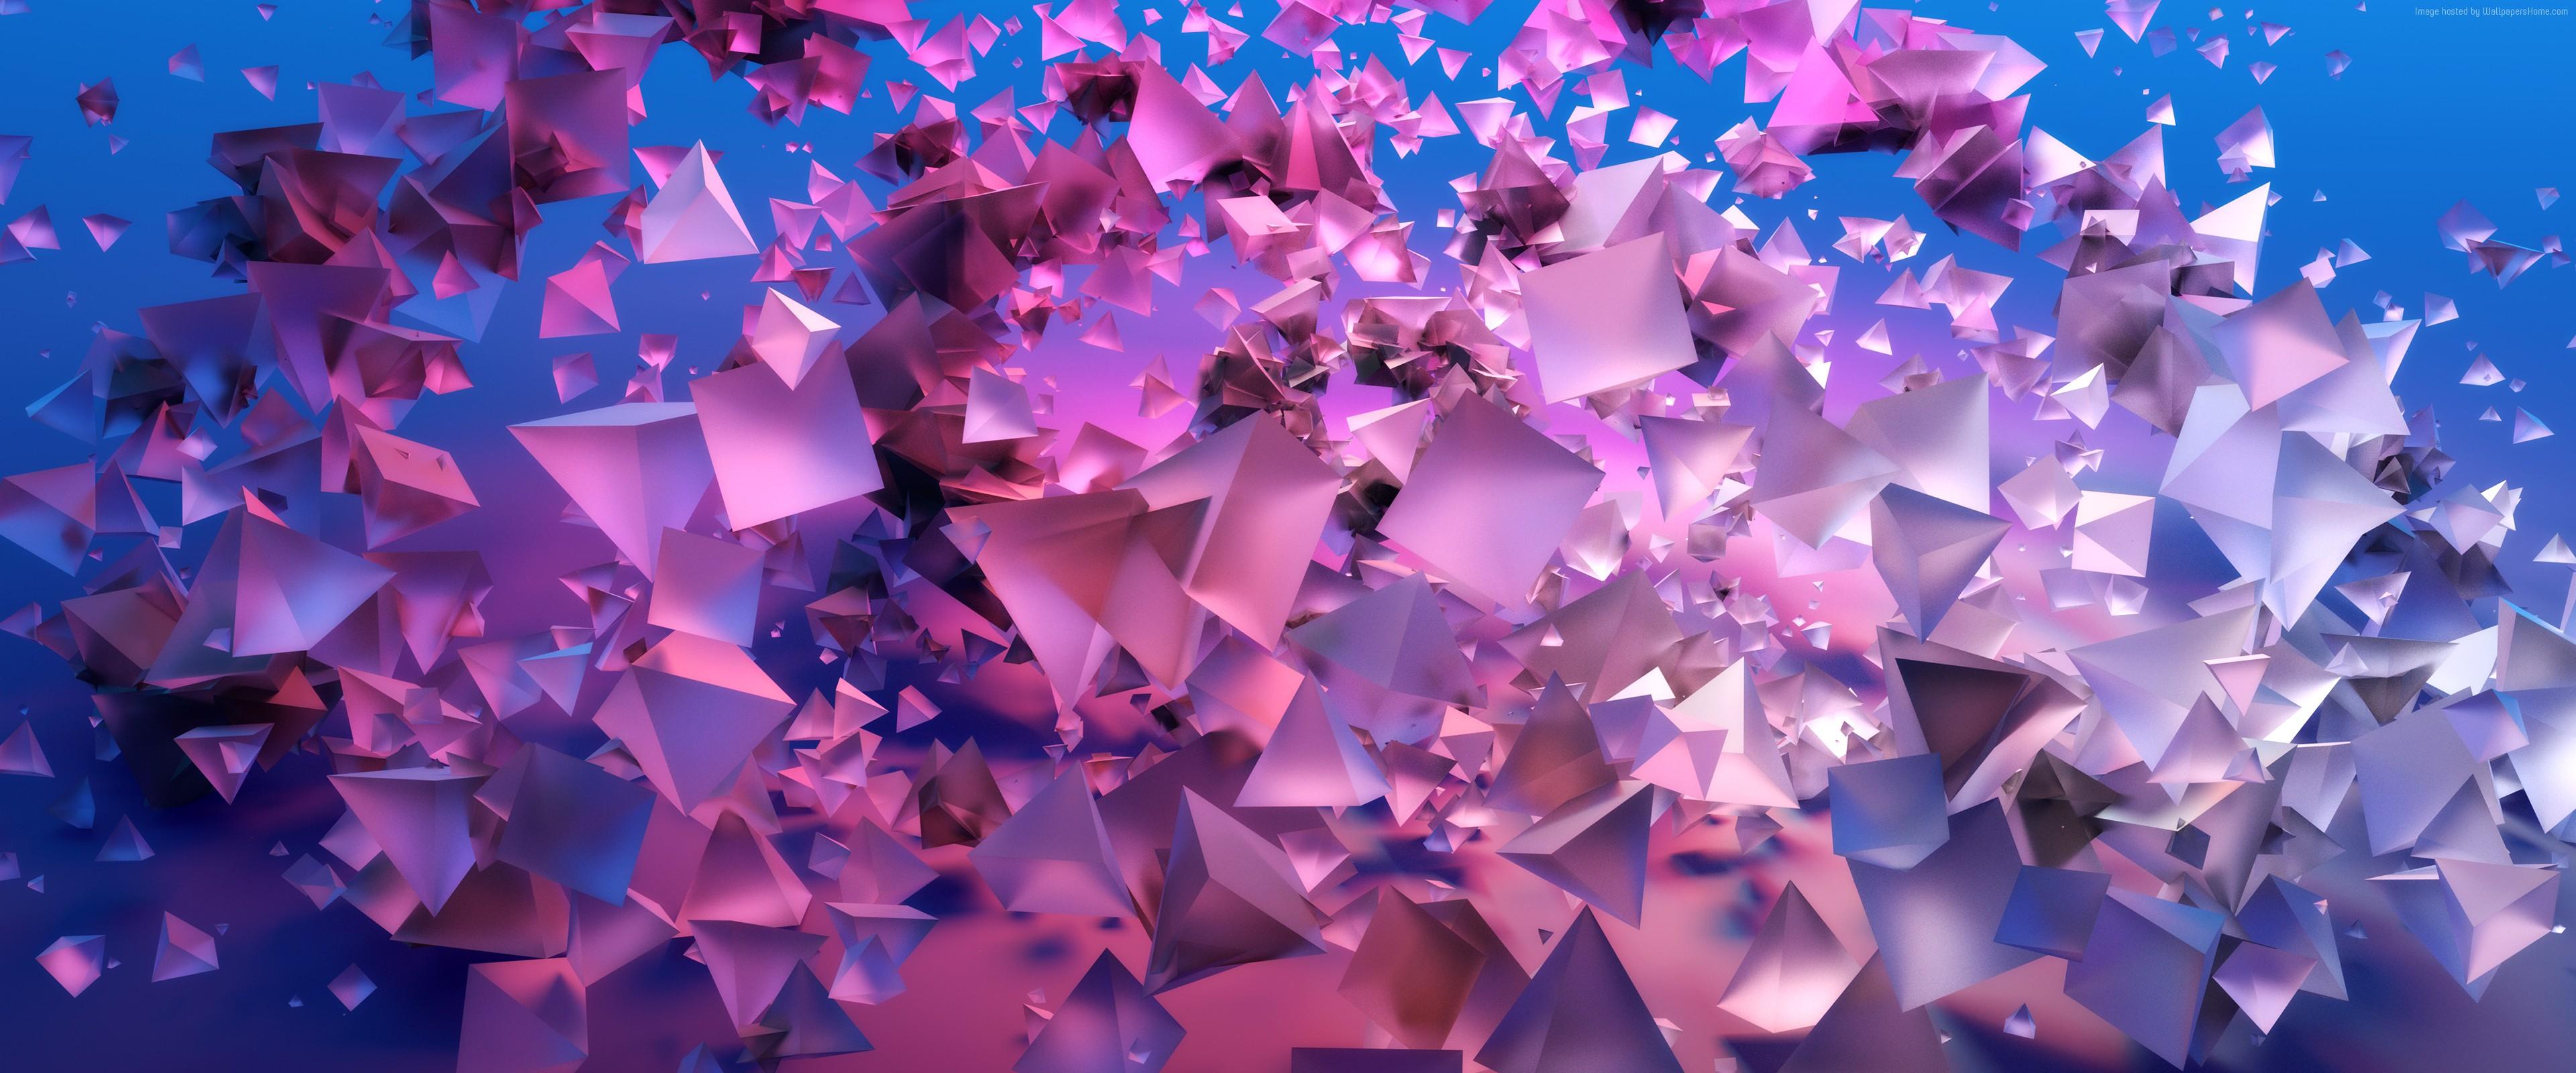 Wallpaper Pyramids 3d Violet Blue 4k Abstract Wallpaper